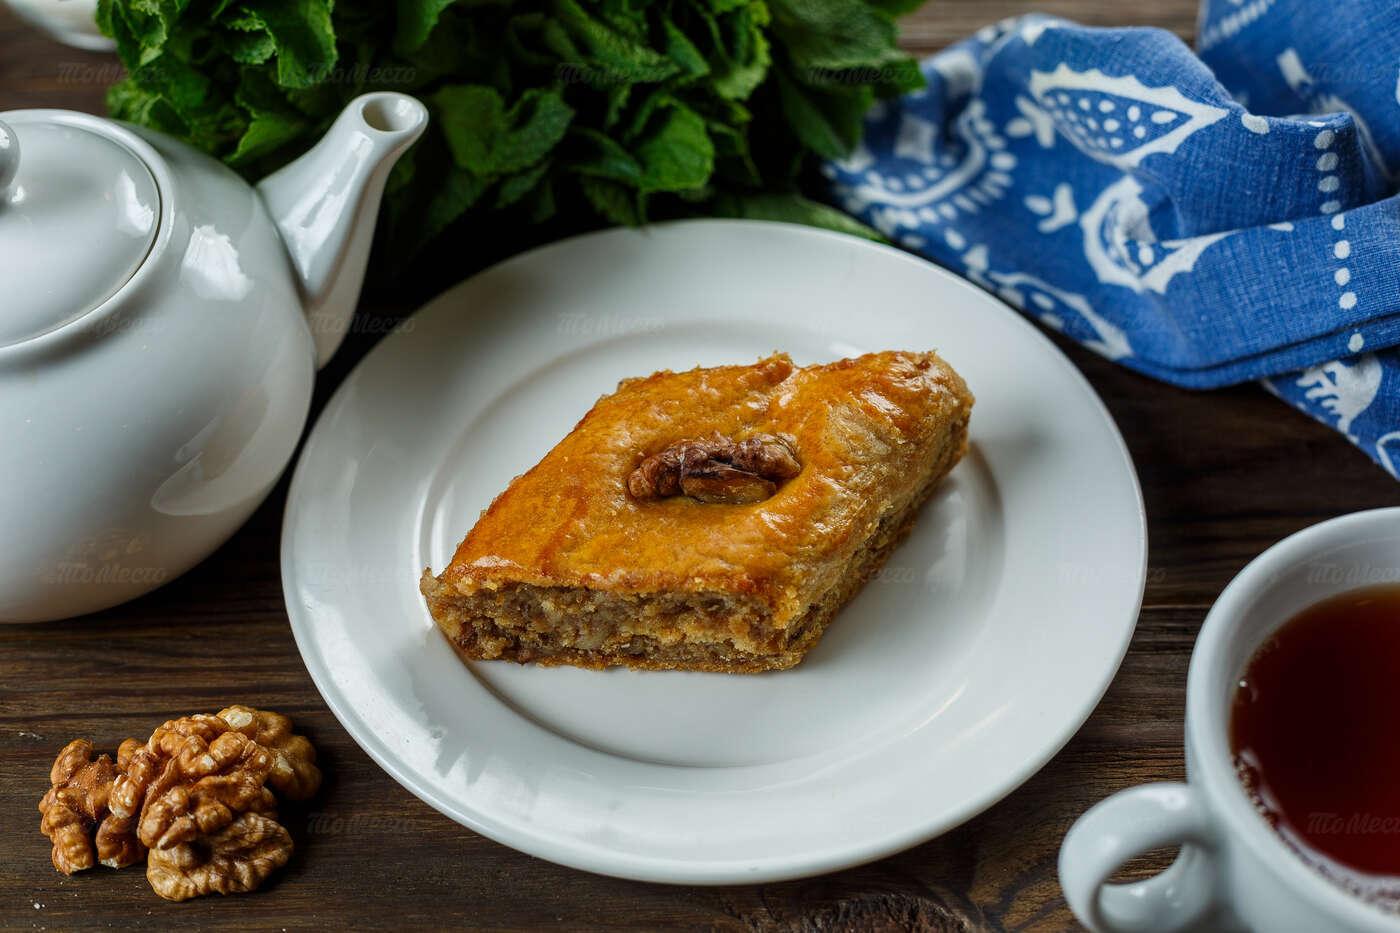 Меню кафе Хинкали & Хачапури на Льва Толстого фото 36